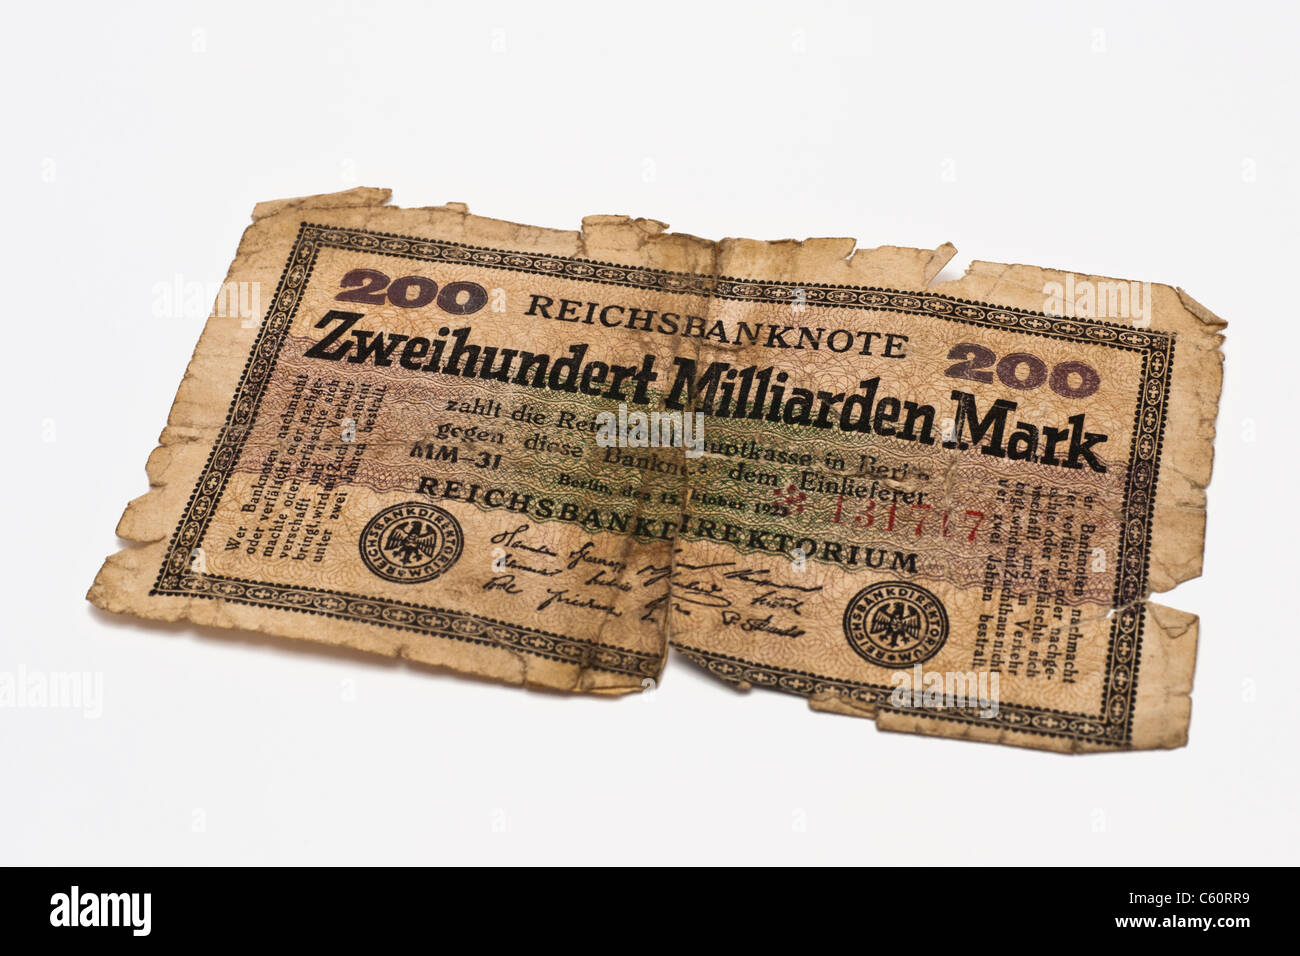 banknote reichsmark stockfotos banknote reichsmark. Black Bedroom Furniture Sets. Home Design Ideas